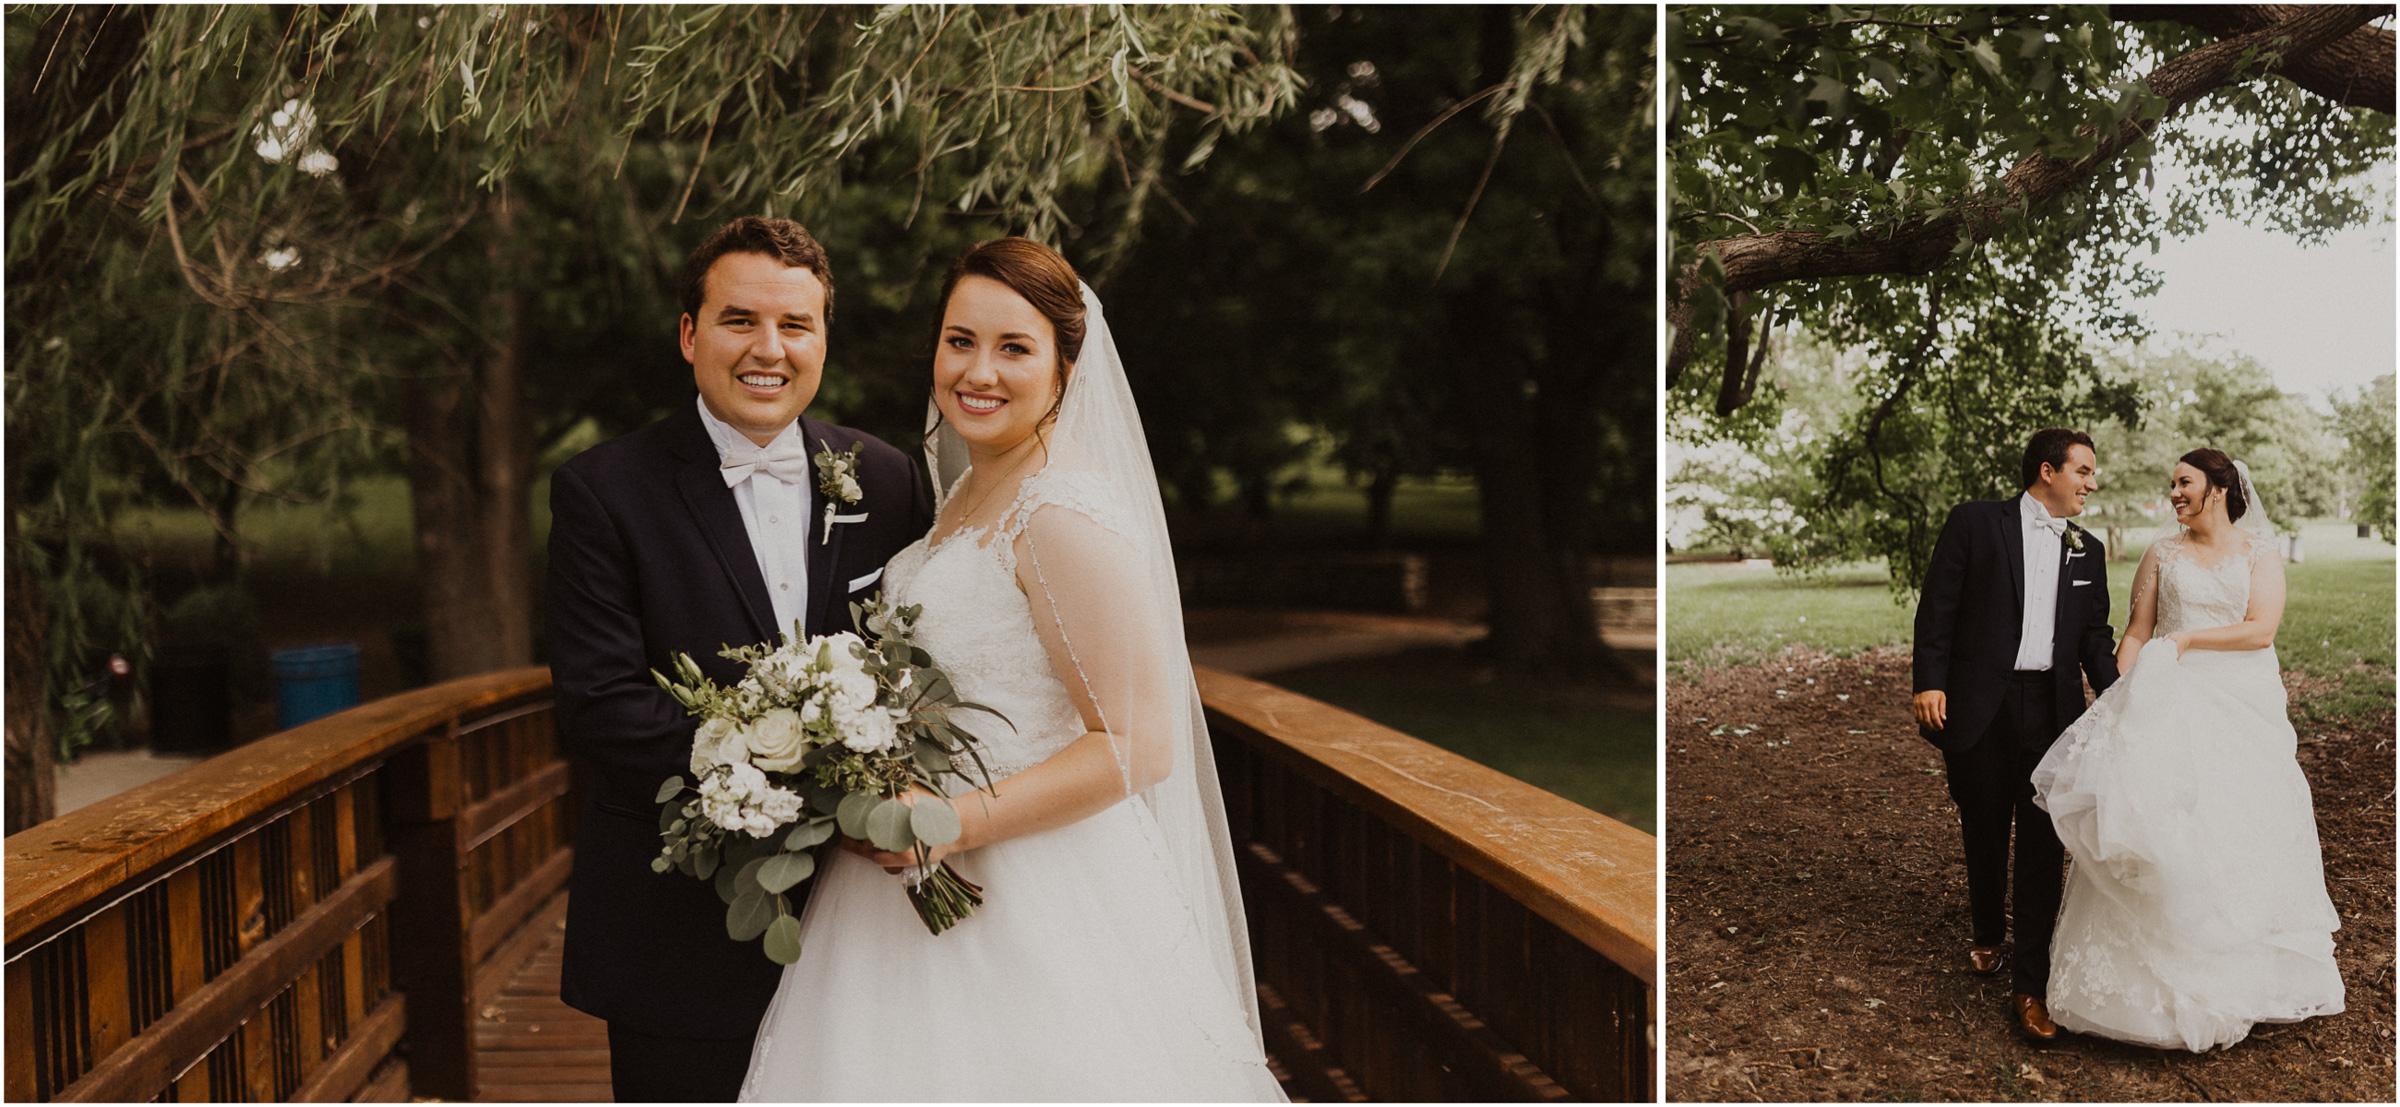 alyssa barletter photography classic kansas city wedding loose park plaza country club summer wedding-25.jpg